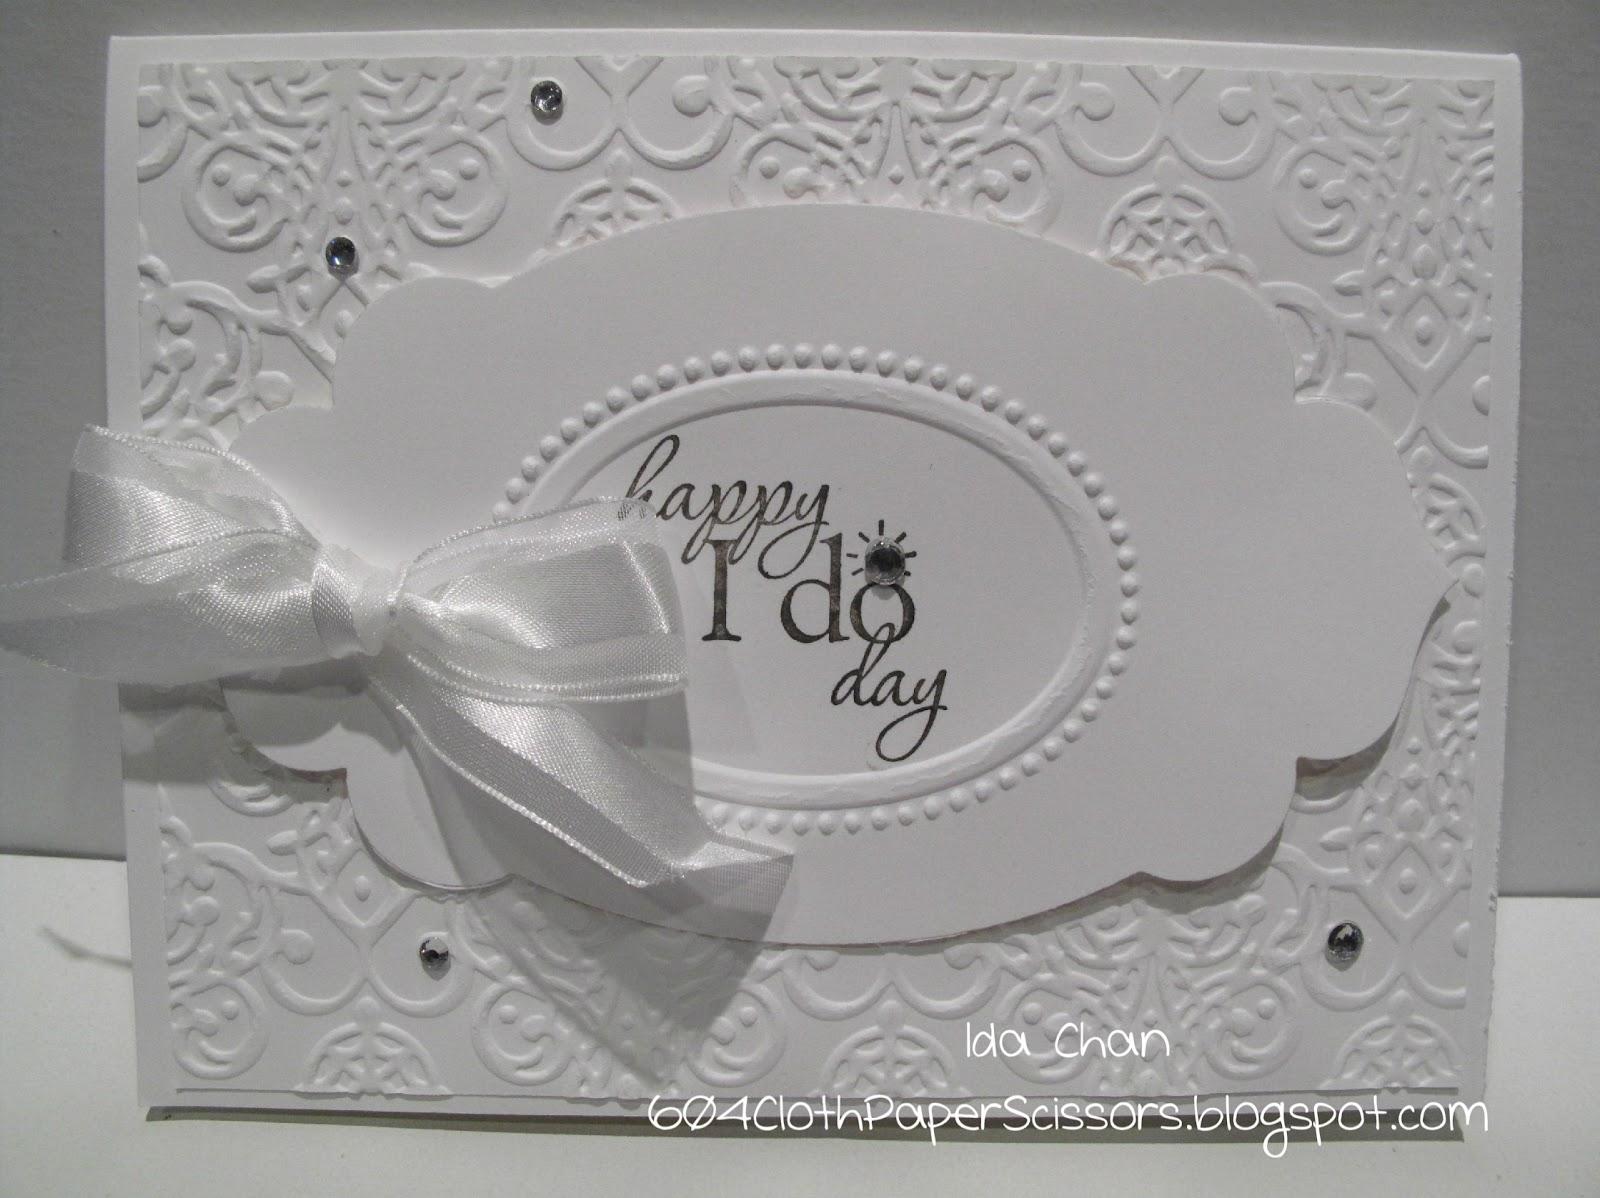 How to scrapbook wedding cards - Happy I Do Day Wedding Card By Ida Chan